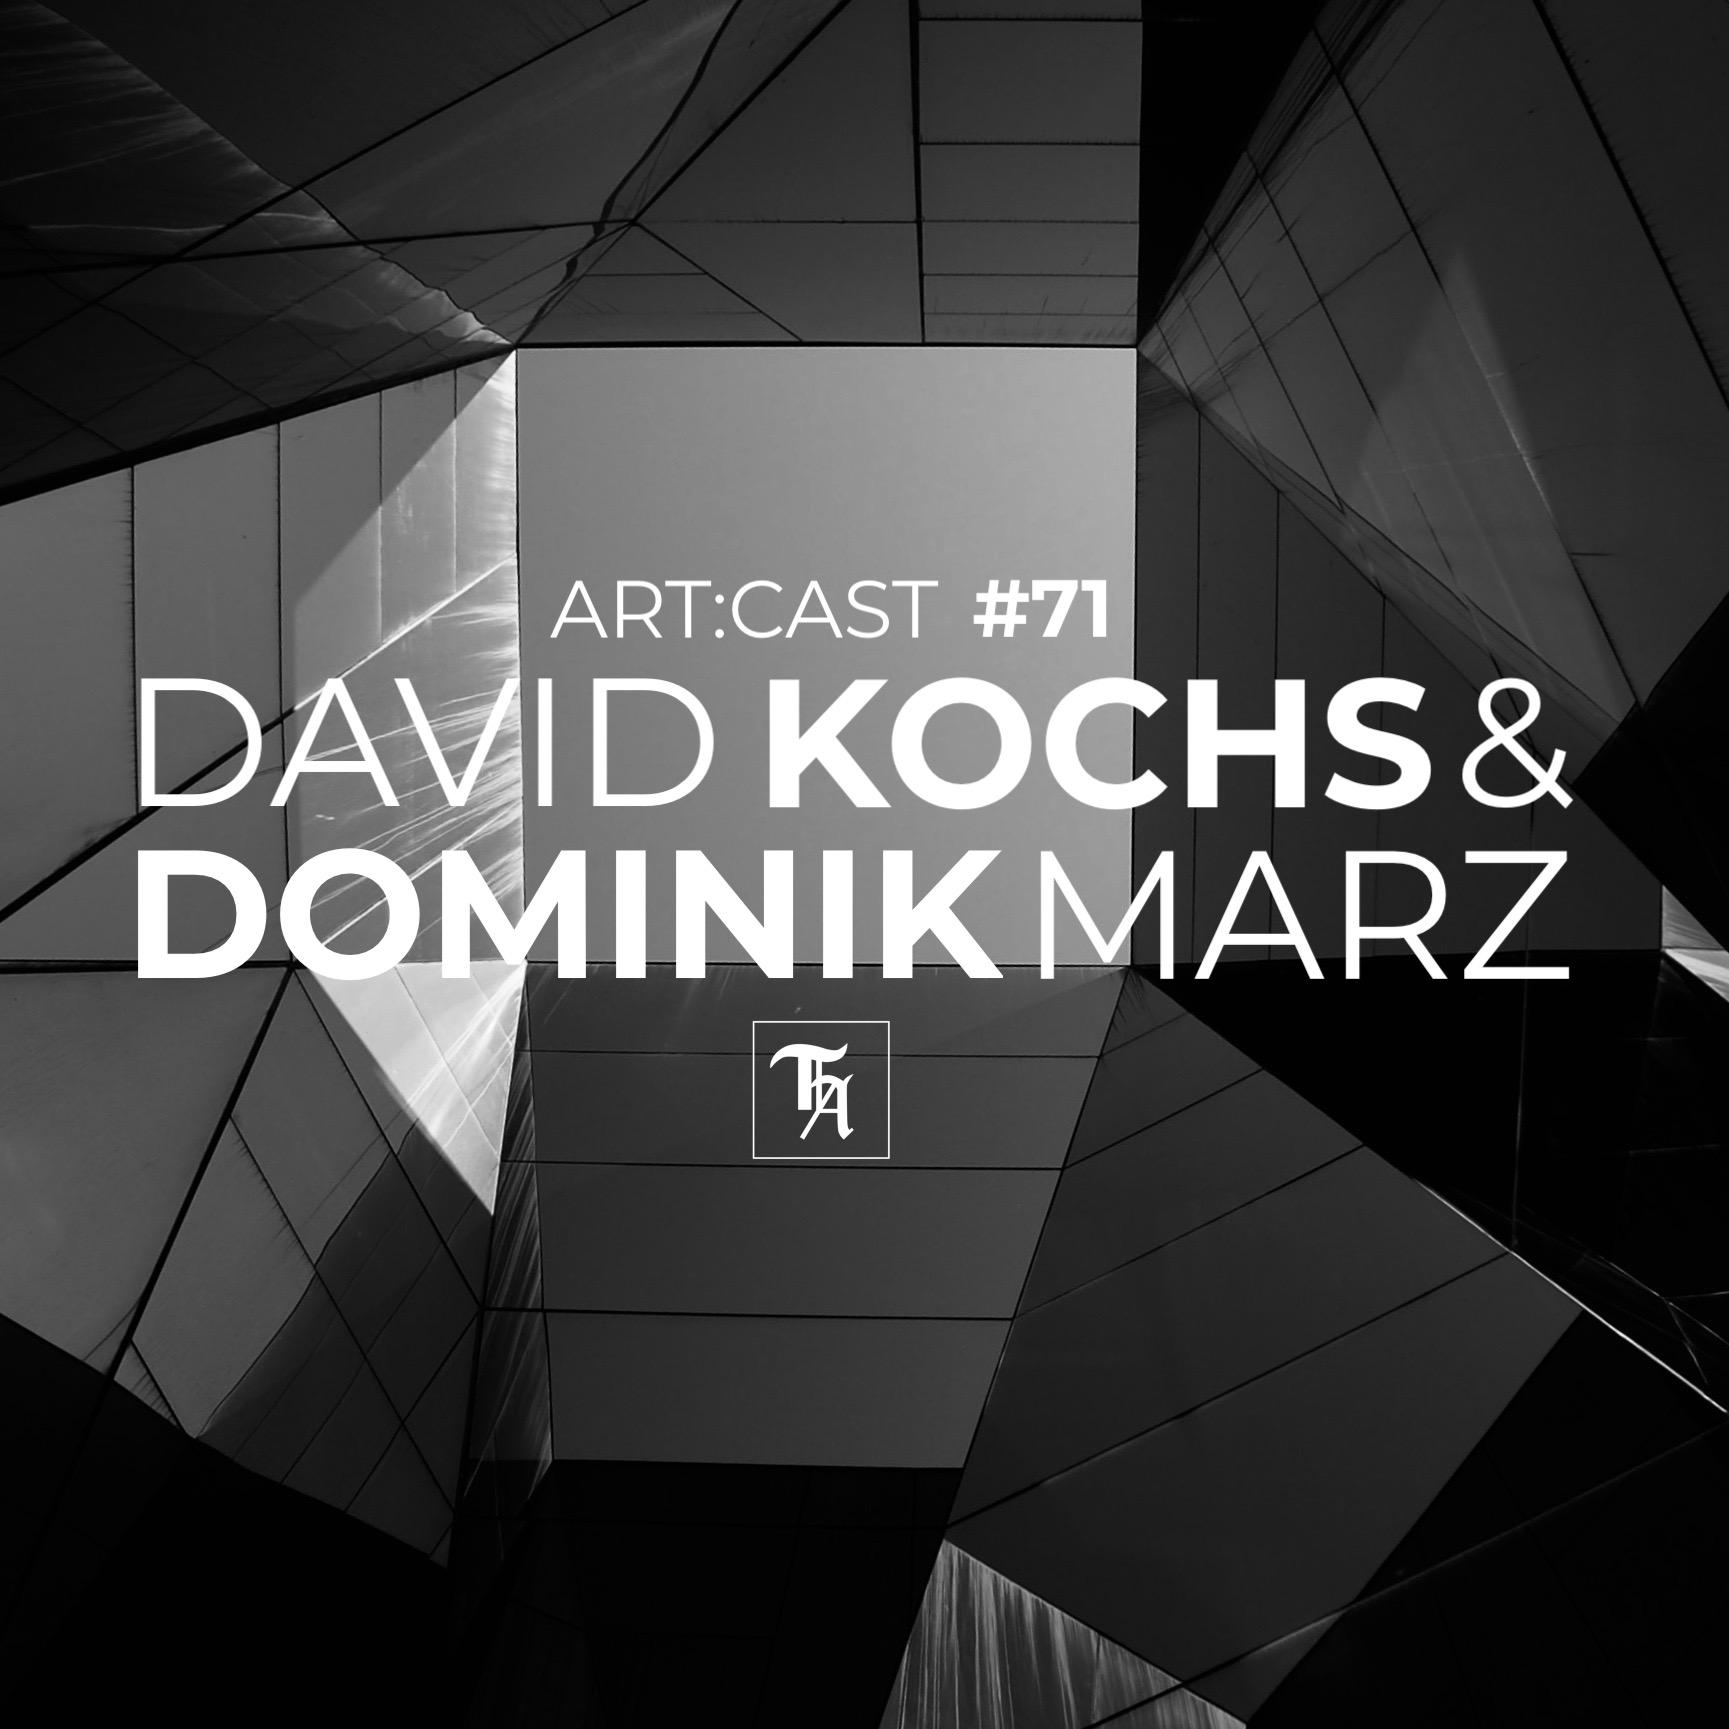 ARTCAST 21 by David Kochs & Dominik Marz – Torture the Artist